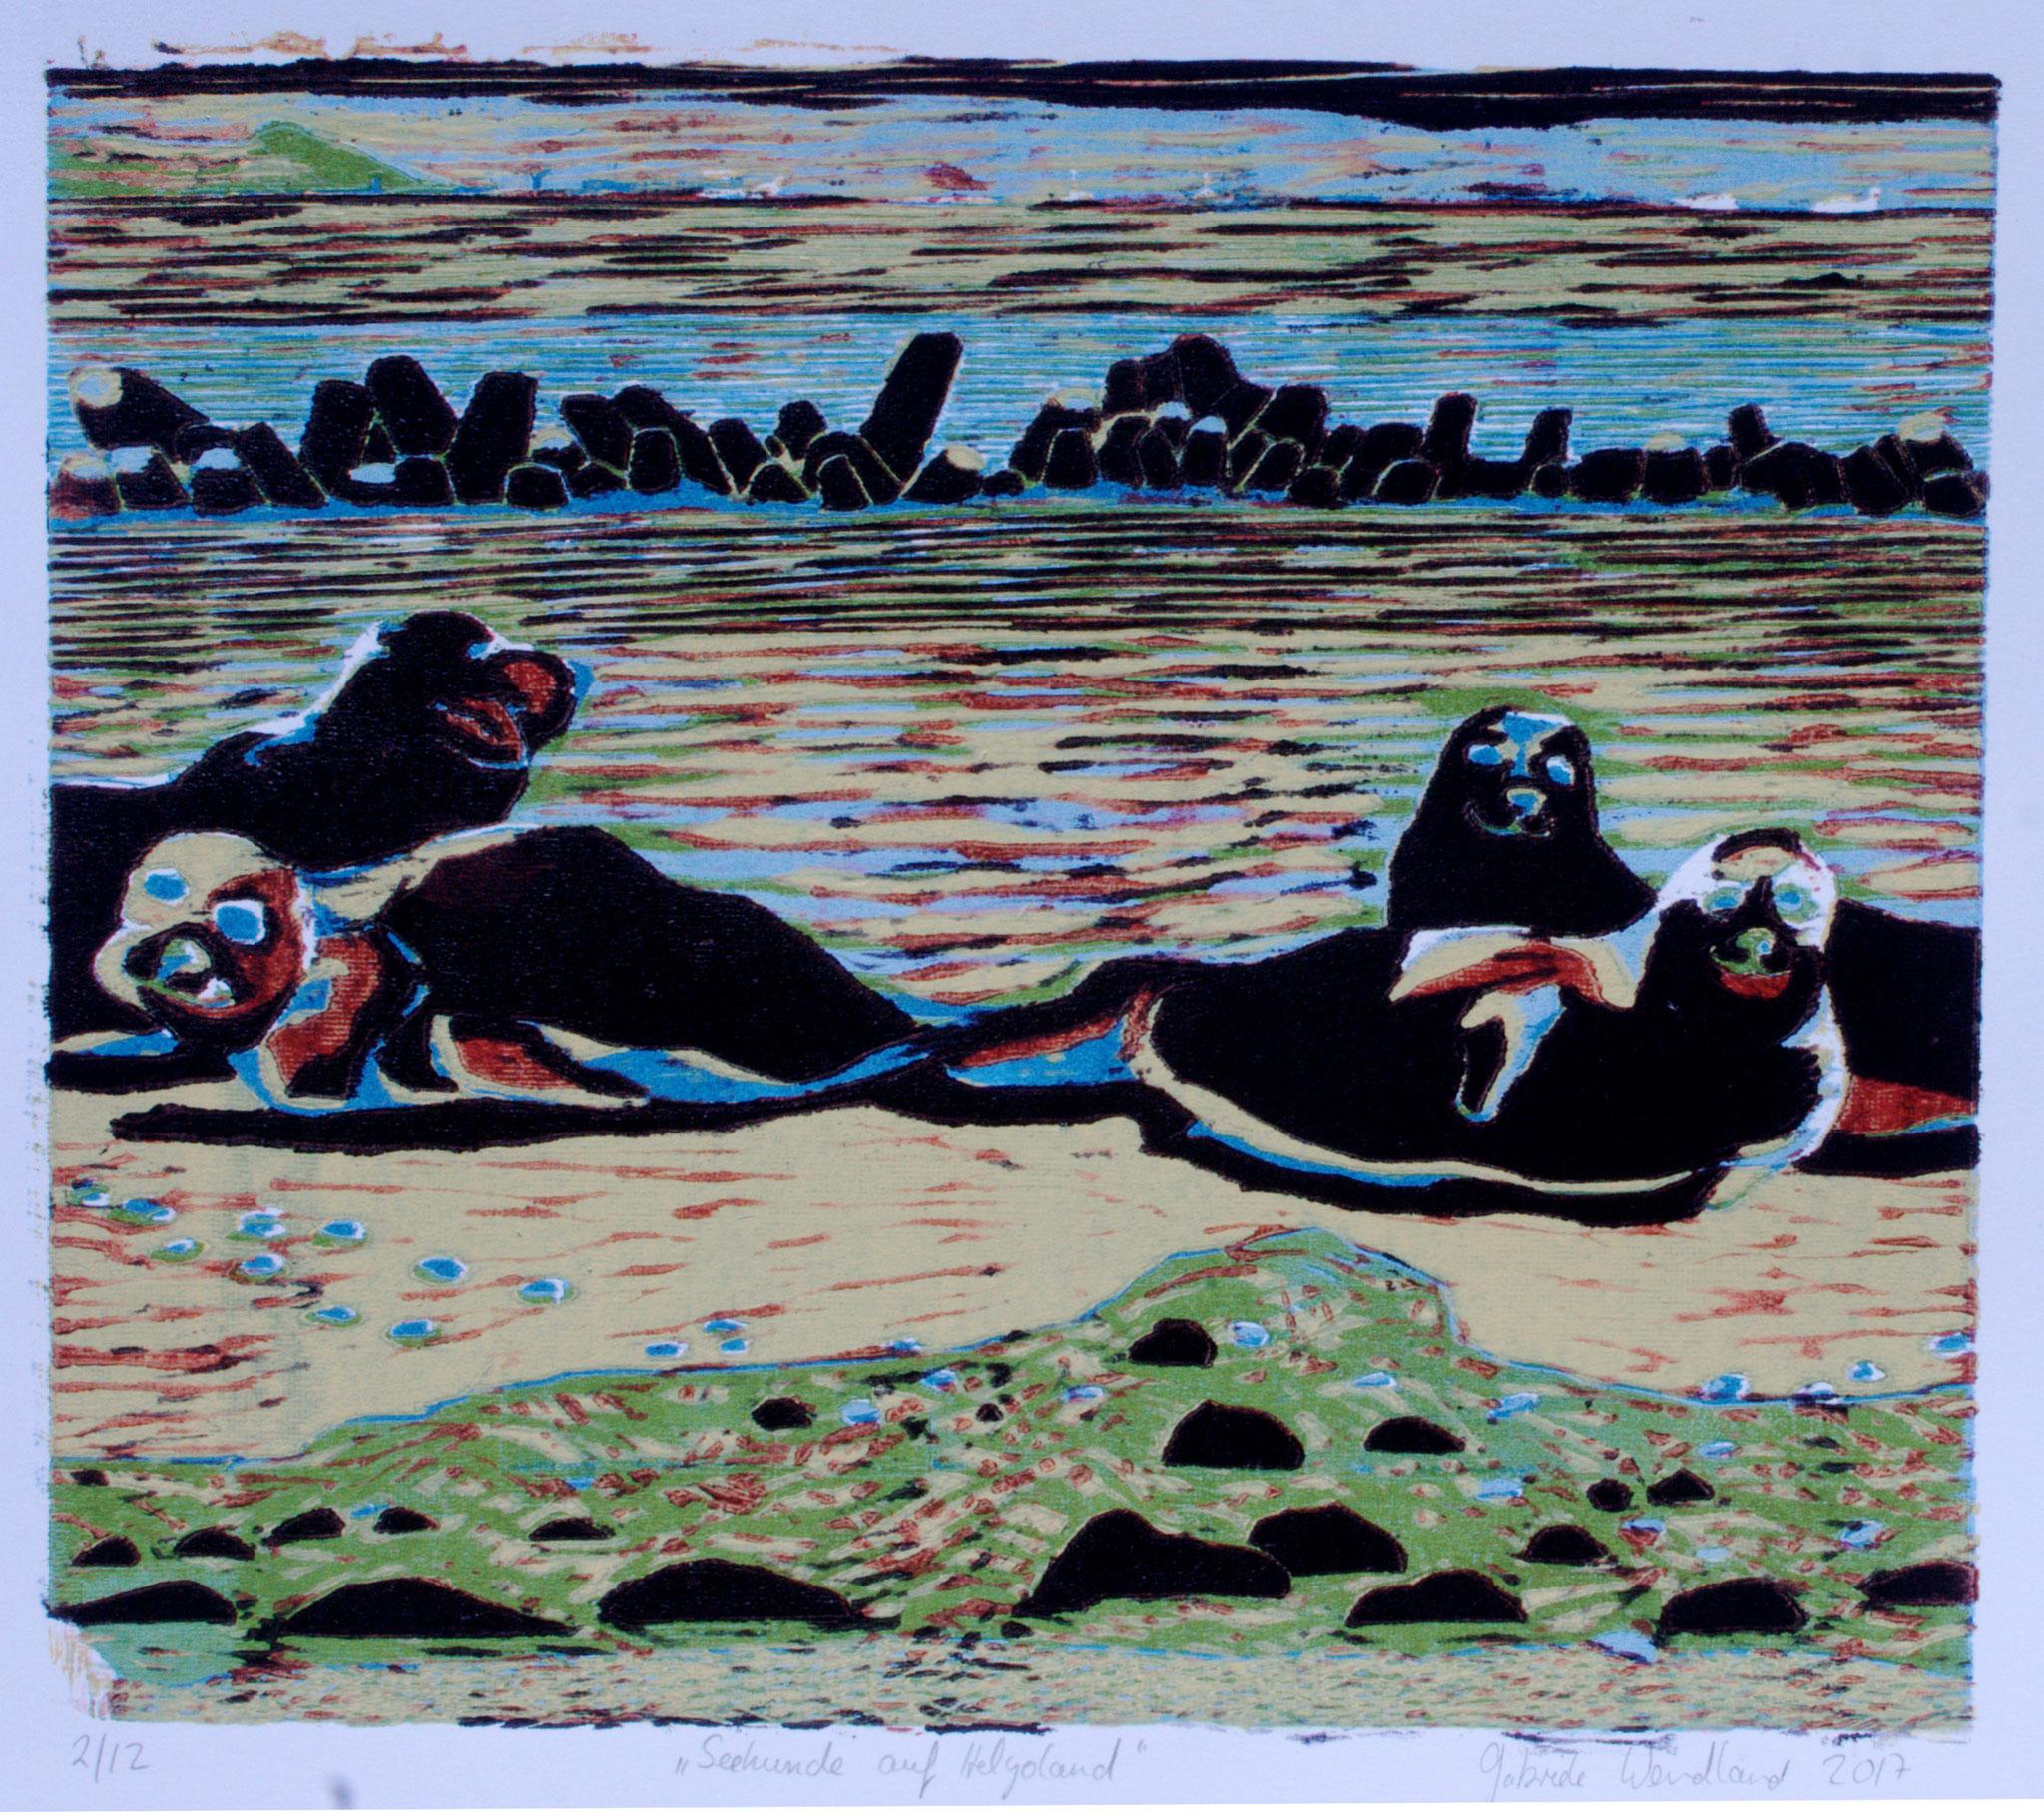 Seehunde auf Helgoland ·2017, Holzschnitt 26 x 30 cm